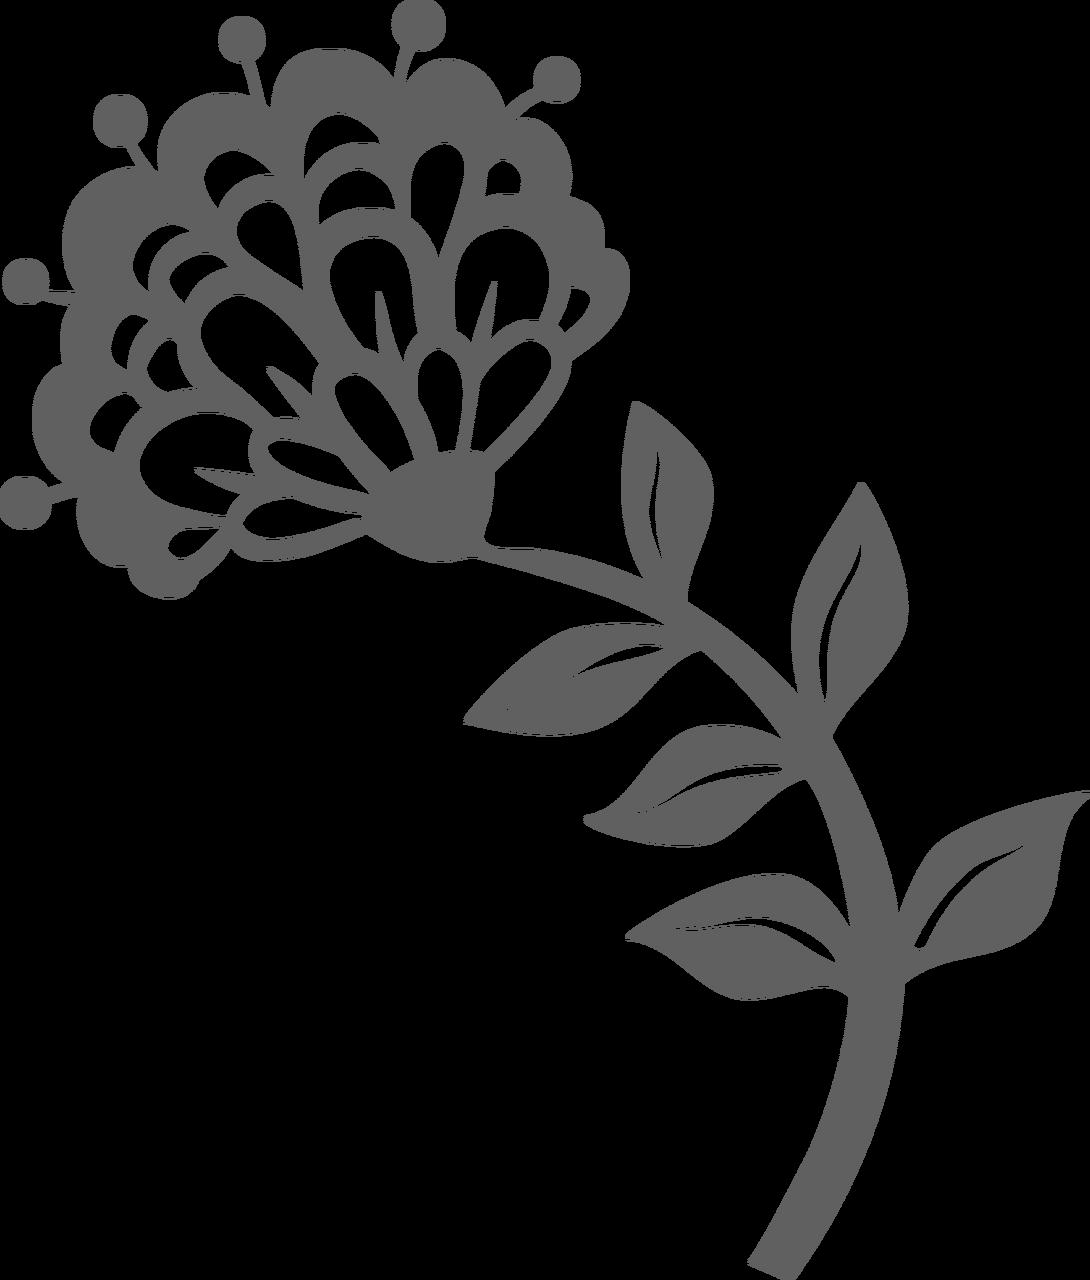 Chrysanthemum SVG Cut File